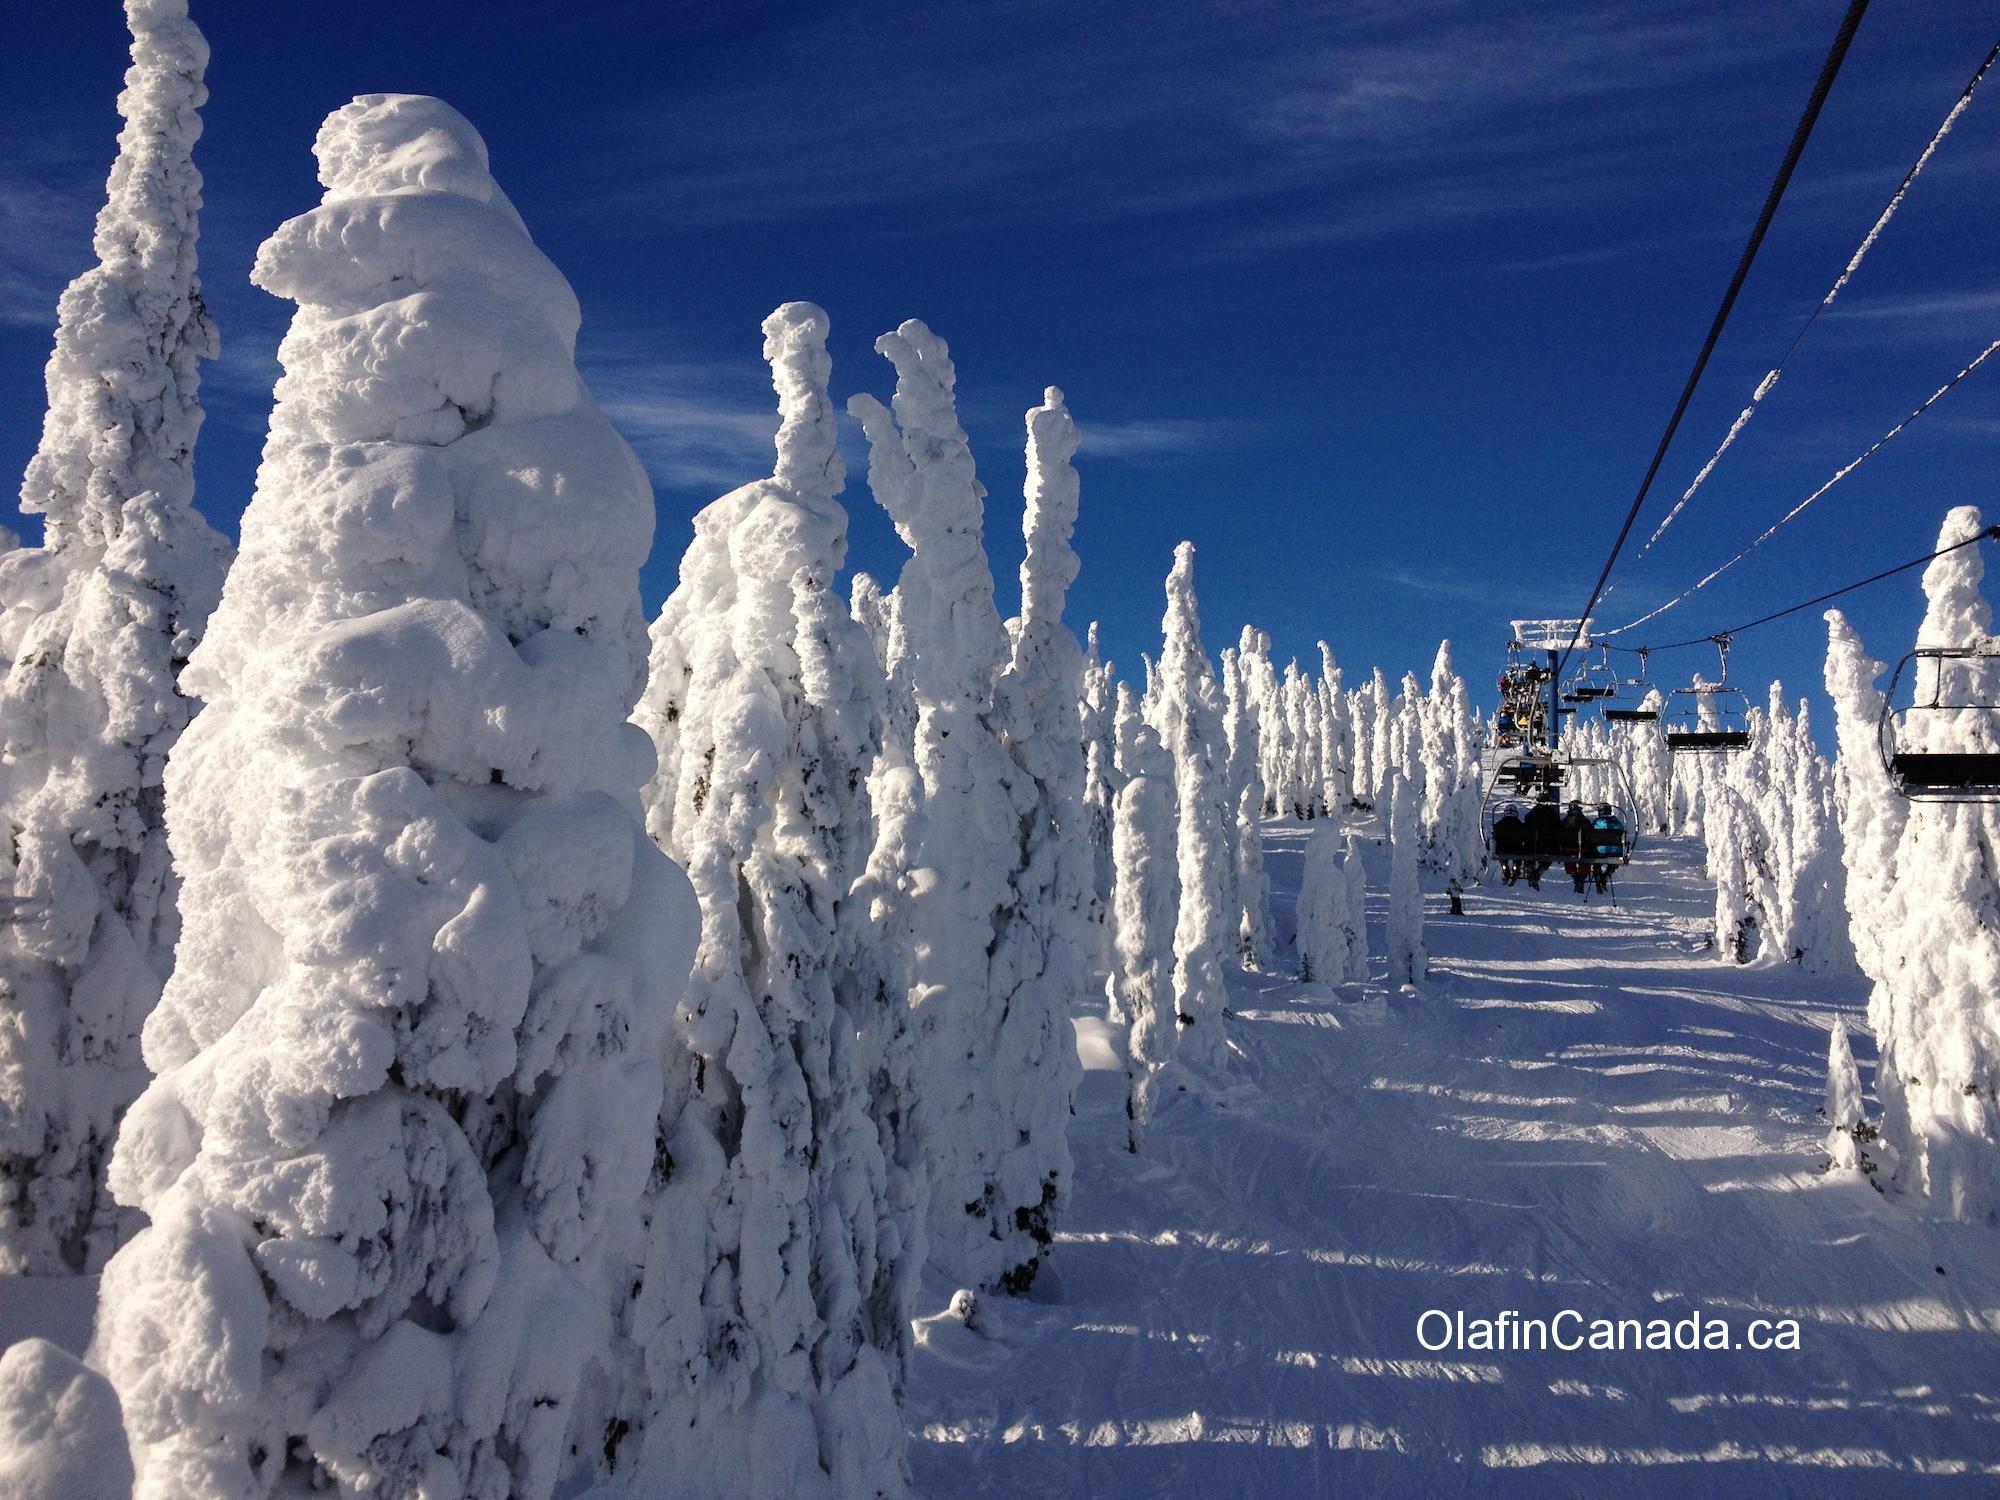 Ski lift alongside the snow ghosts at Big White #olafincanada #britishcolumbia #discoverbc #bigwhite #kelowna #sunshine #snowghosts